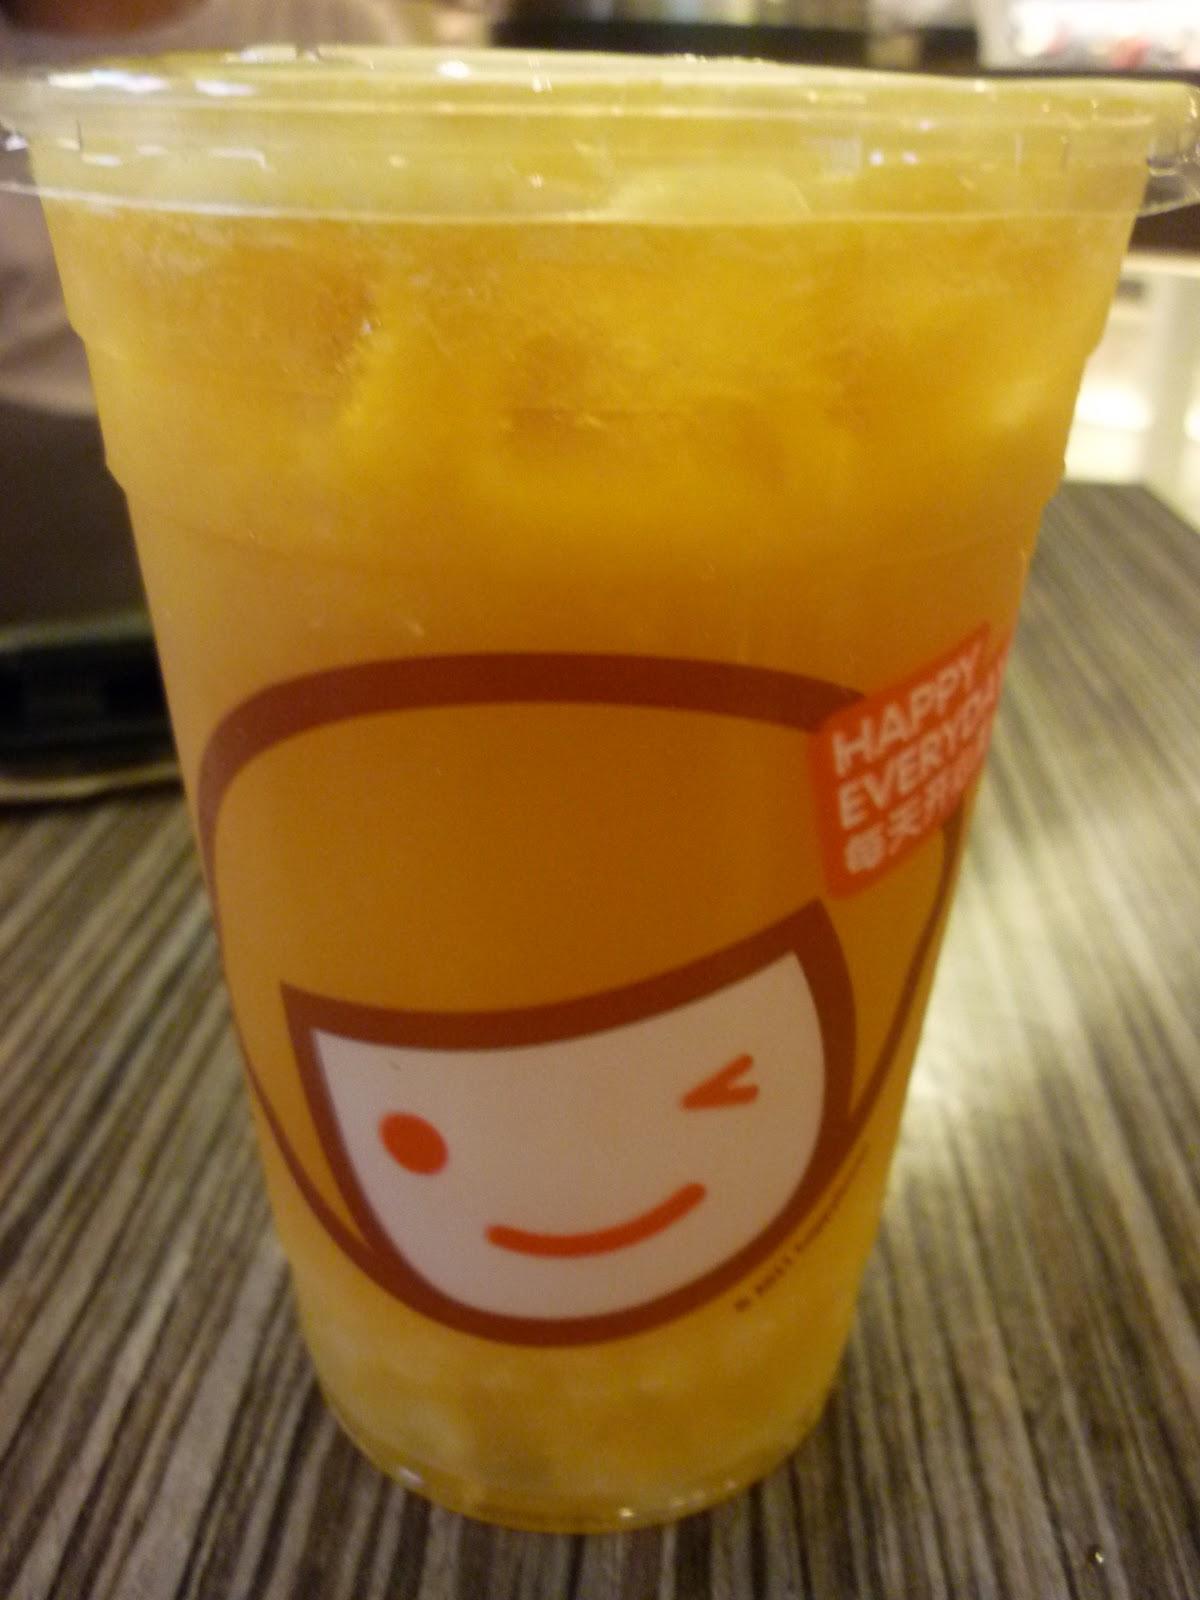 The QQ Brilliant Tea was a bit tart for me.